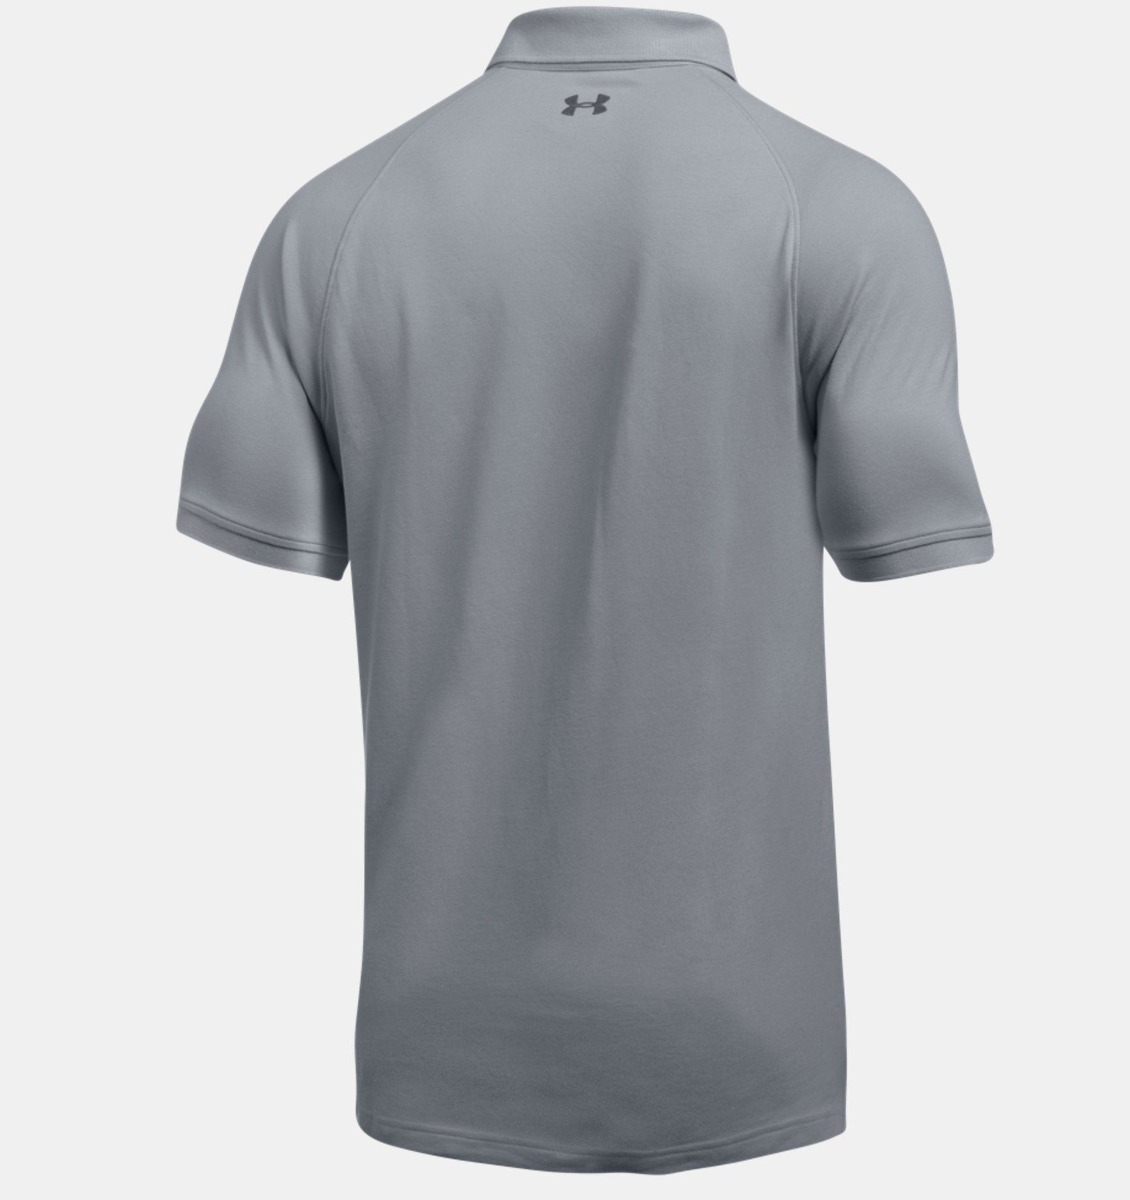 e6ee76036022a Camiseta Under Armour Performance - 113121